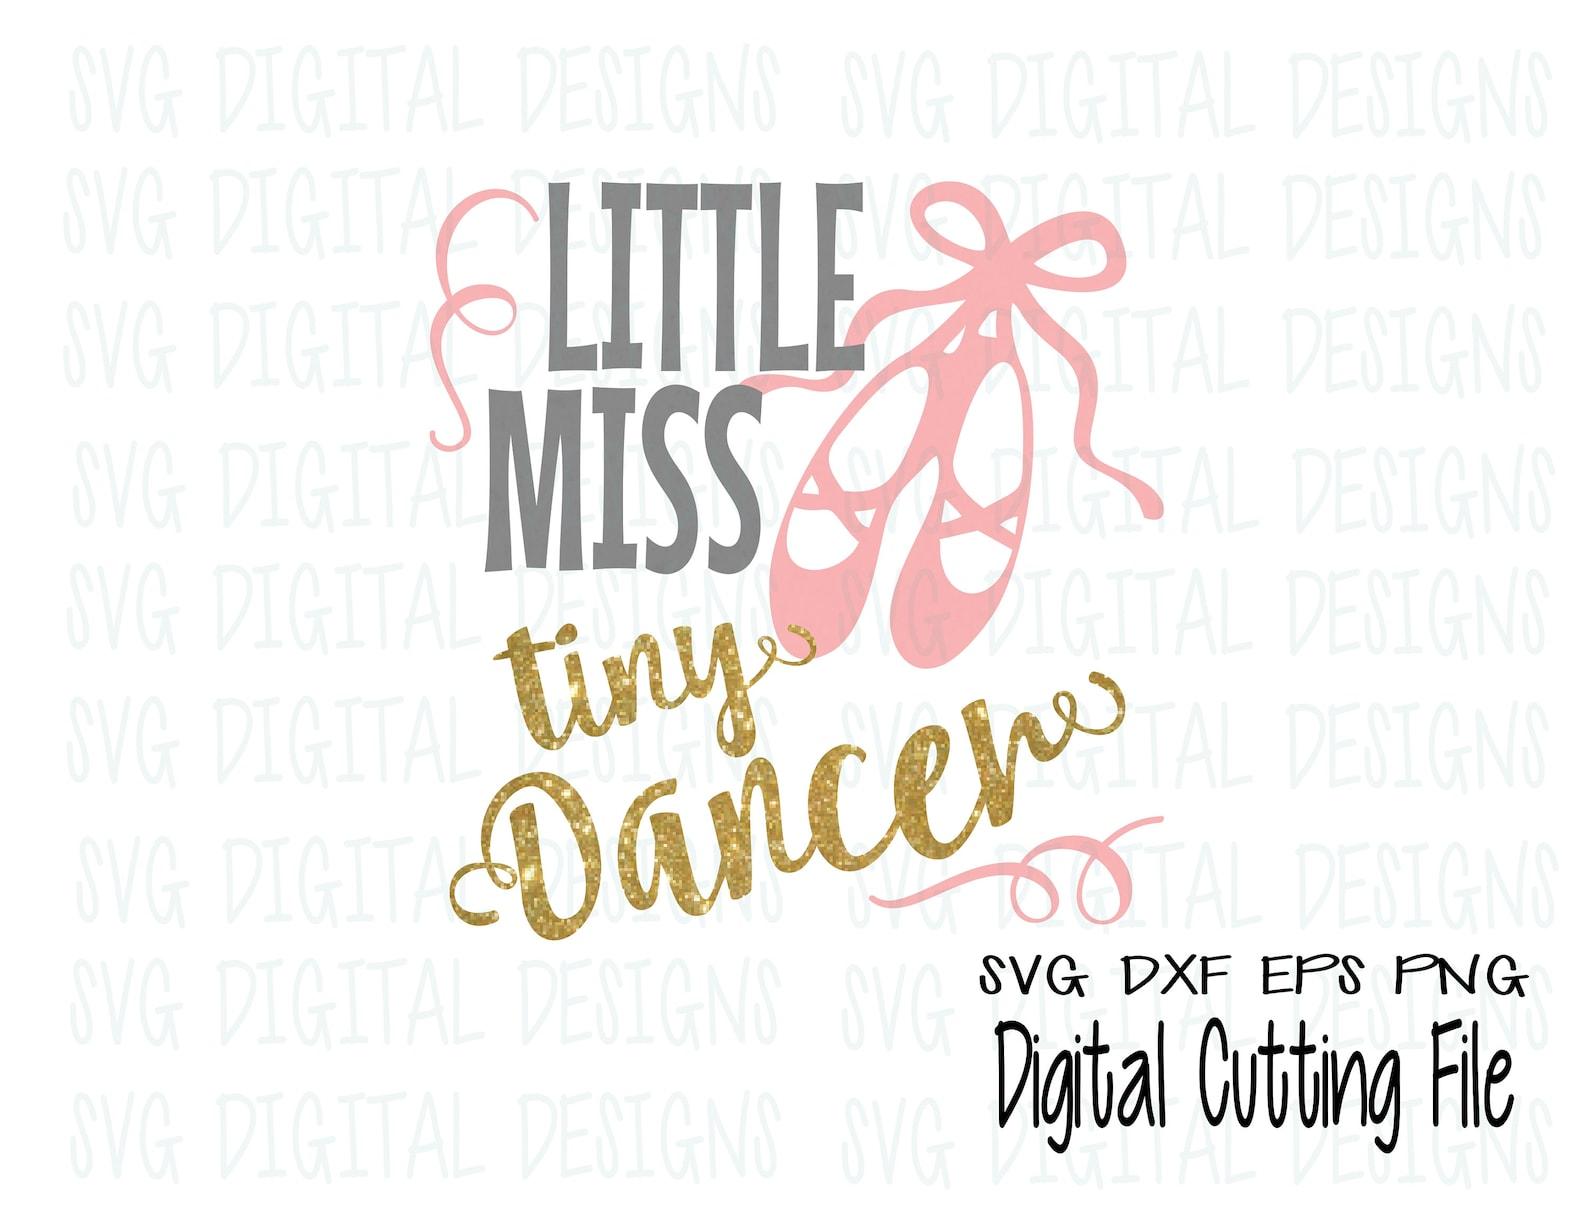 little miss tiny dancer svg cut file design, ballerina ballet shoe dance file for silhouette cricut & more cutting files, svg dx